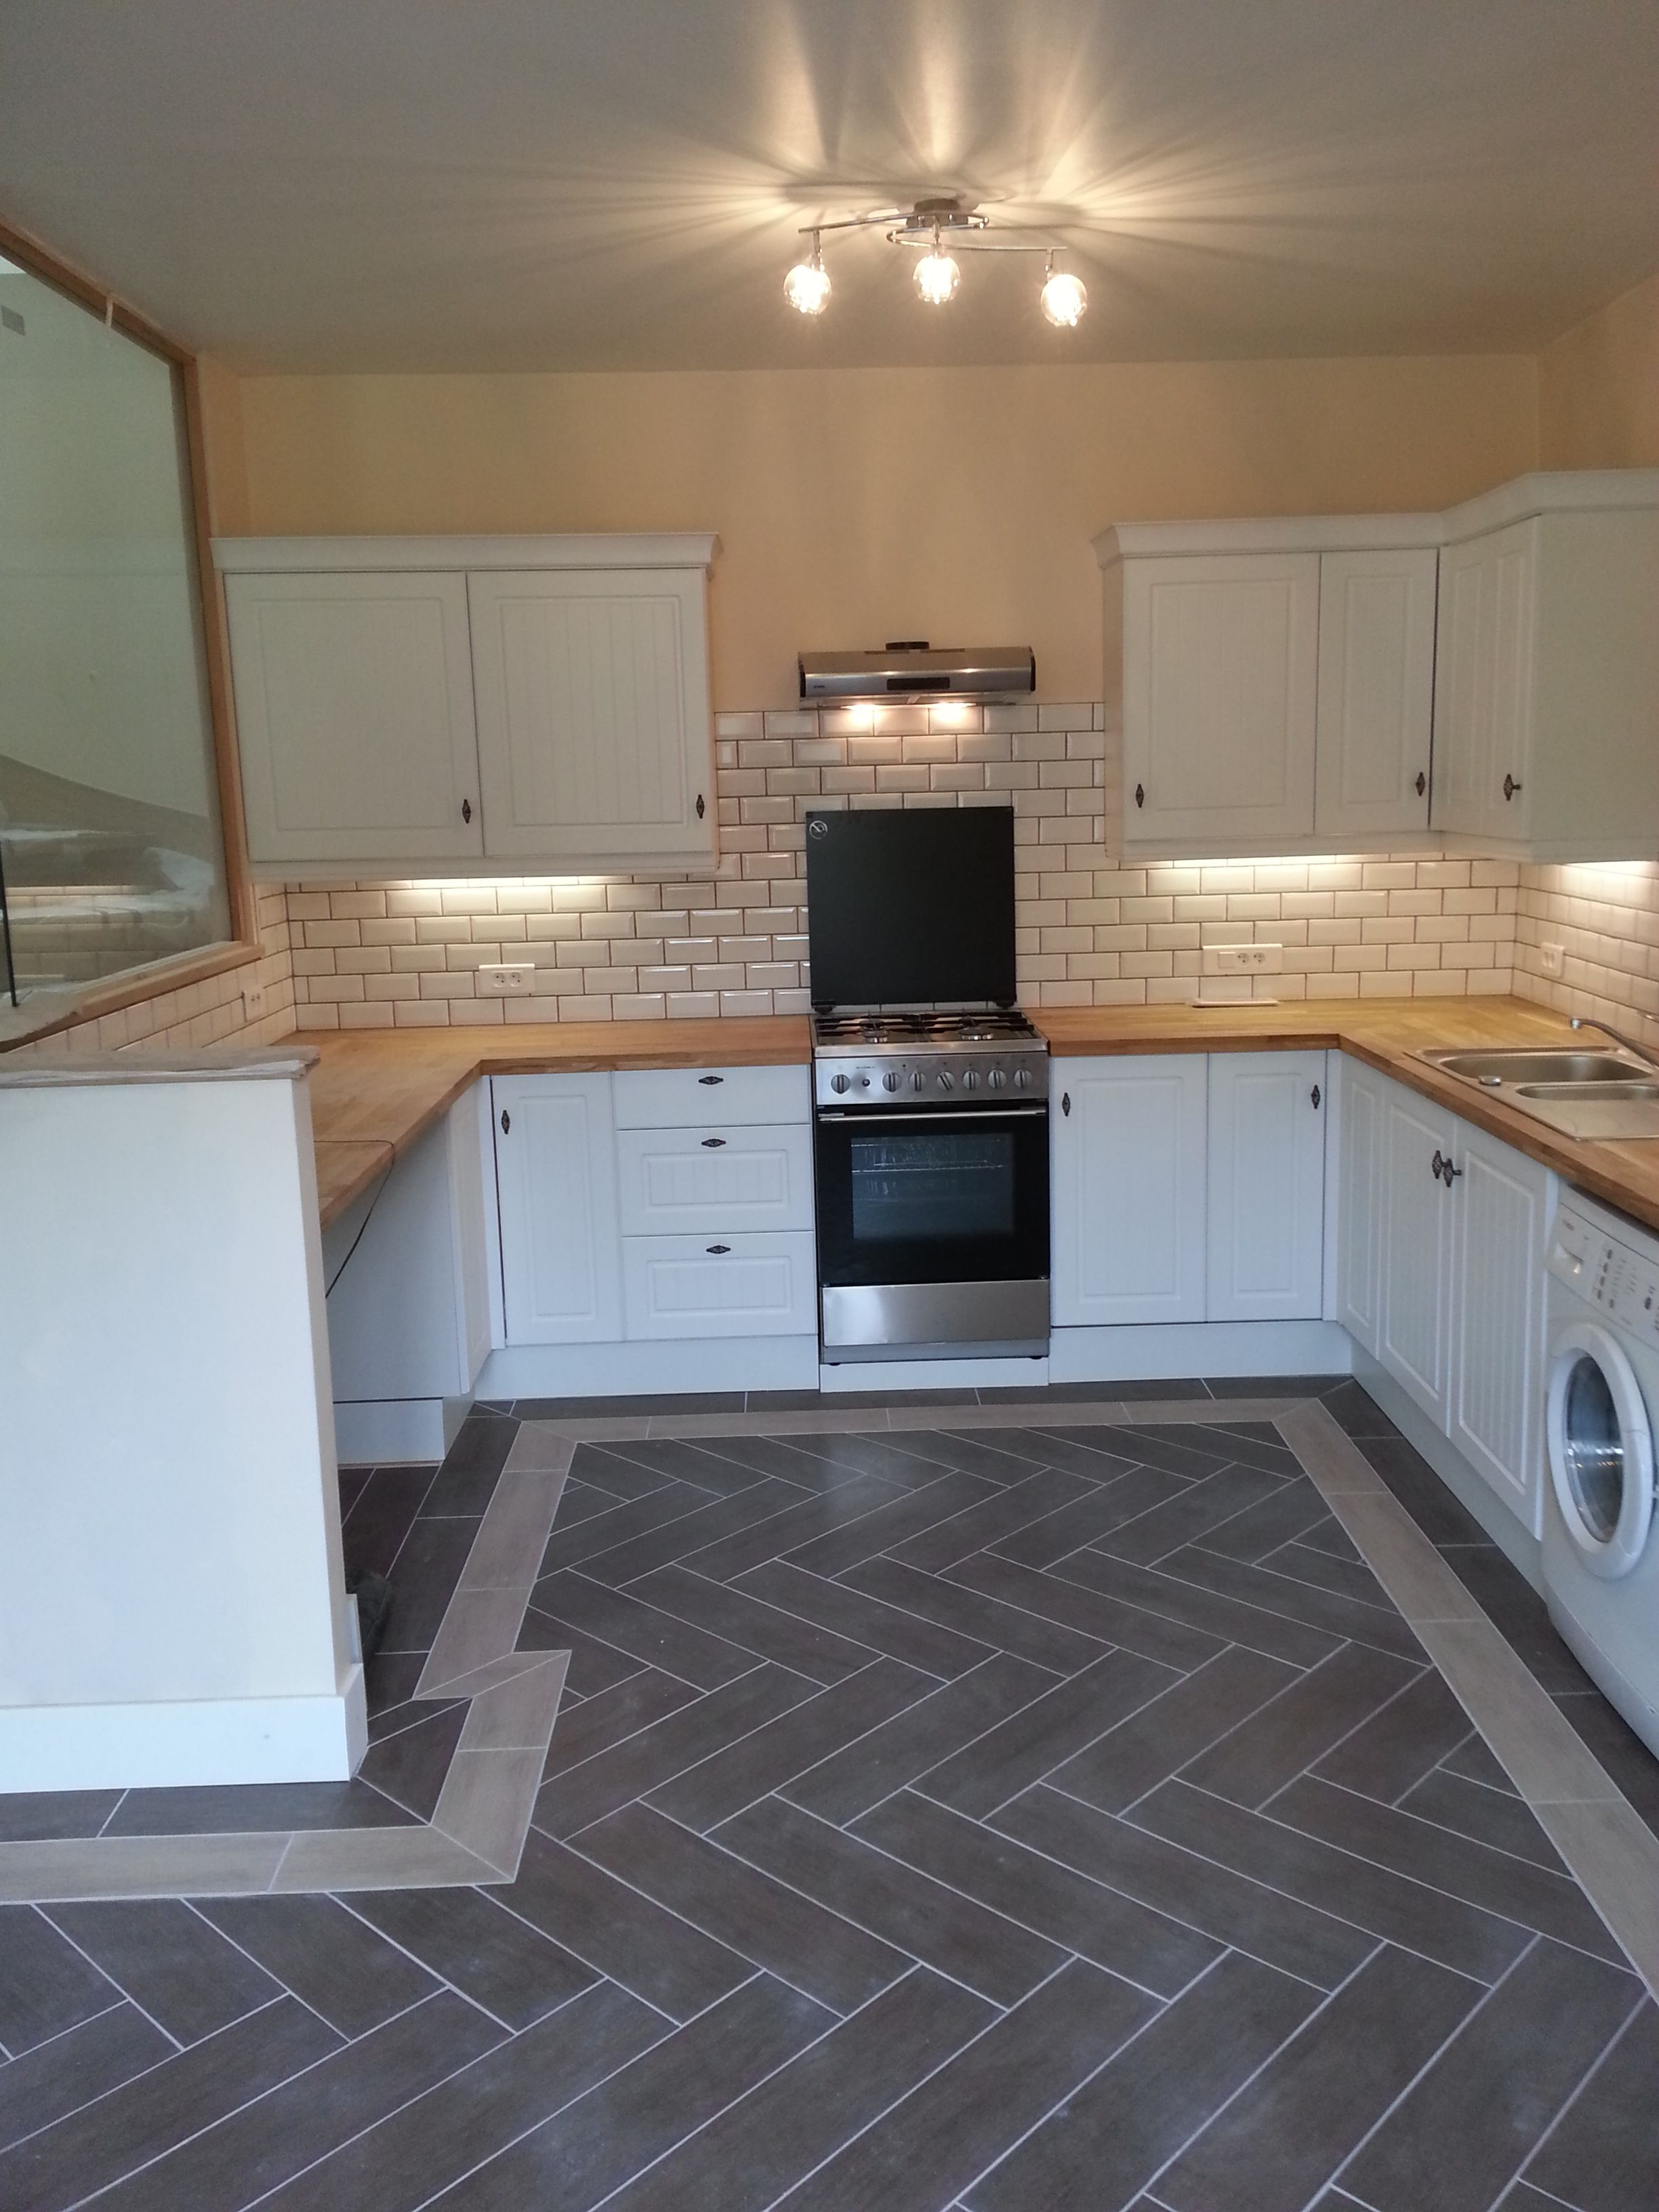 New B&Q Country Style Kitchen, herringbone tiled floor